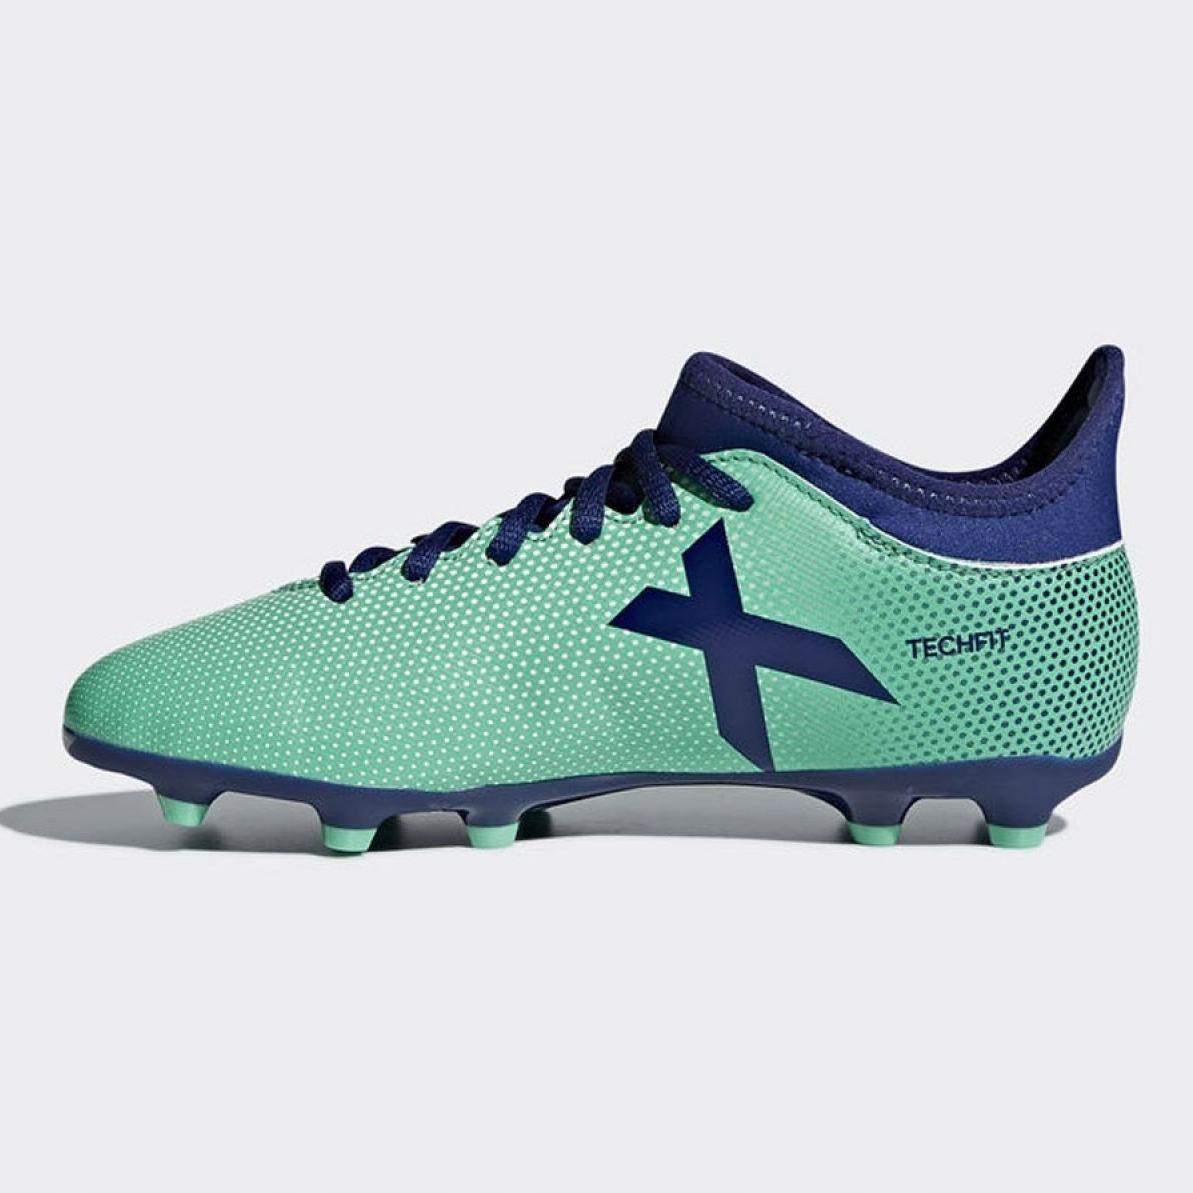 métrico La playa Barrio  Football shoes adidas X 17.3 Fg Jr CP8993 multicolored blue - ButyModne.pl